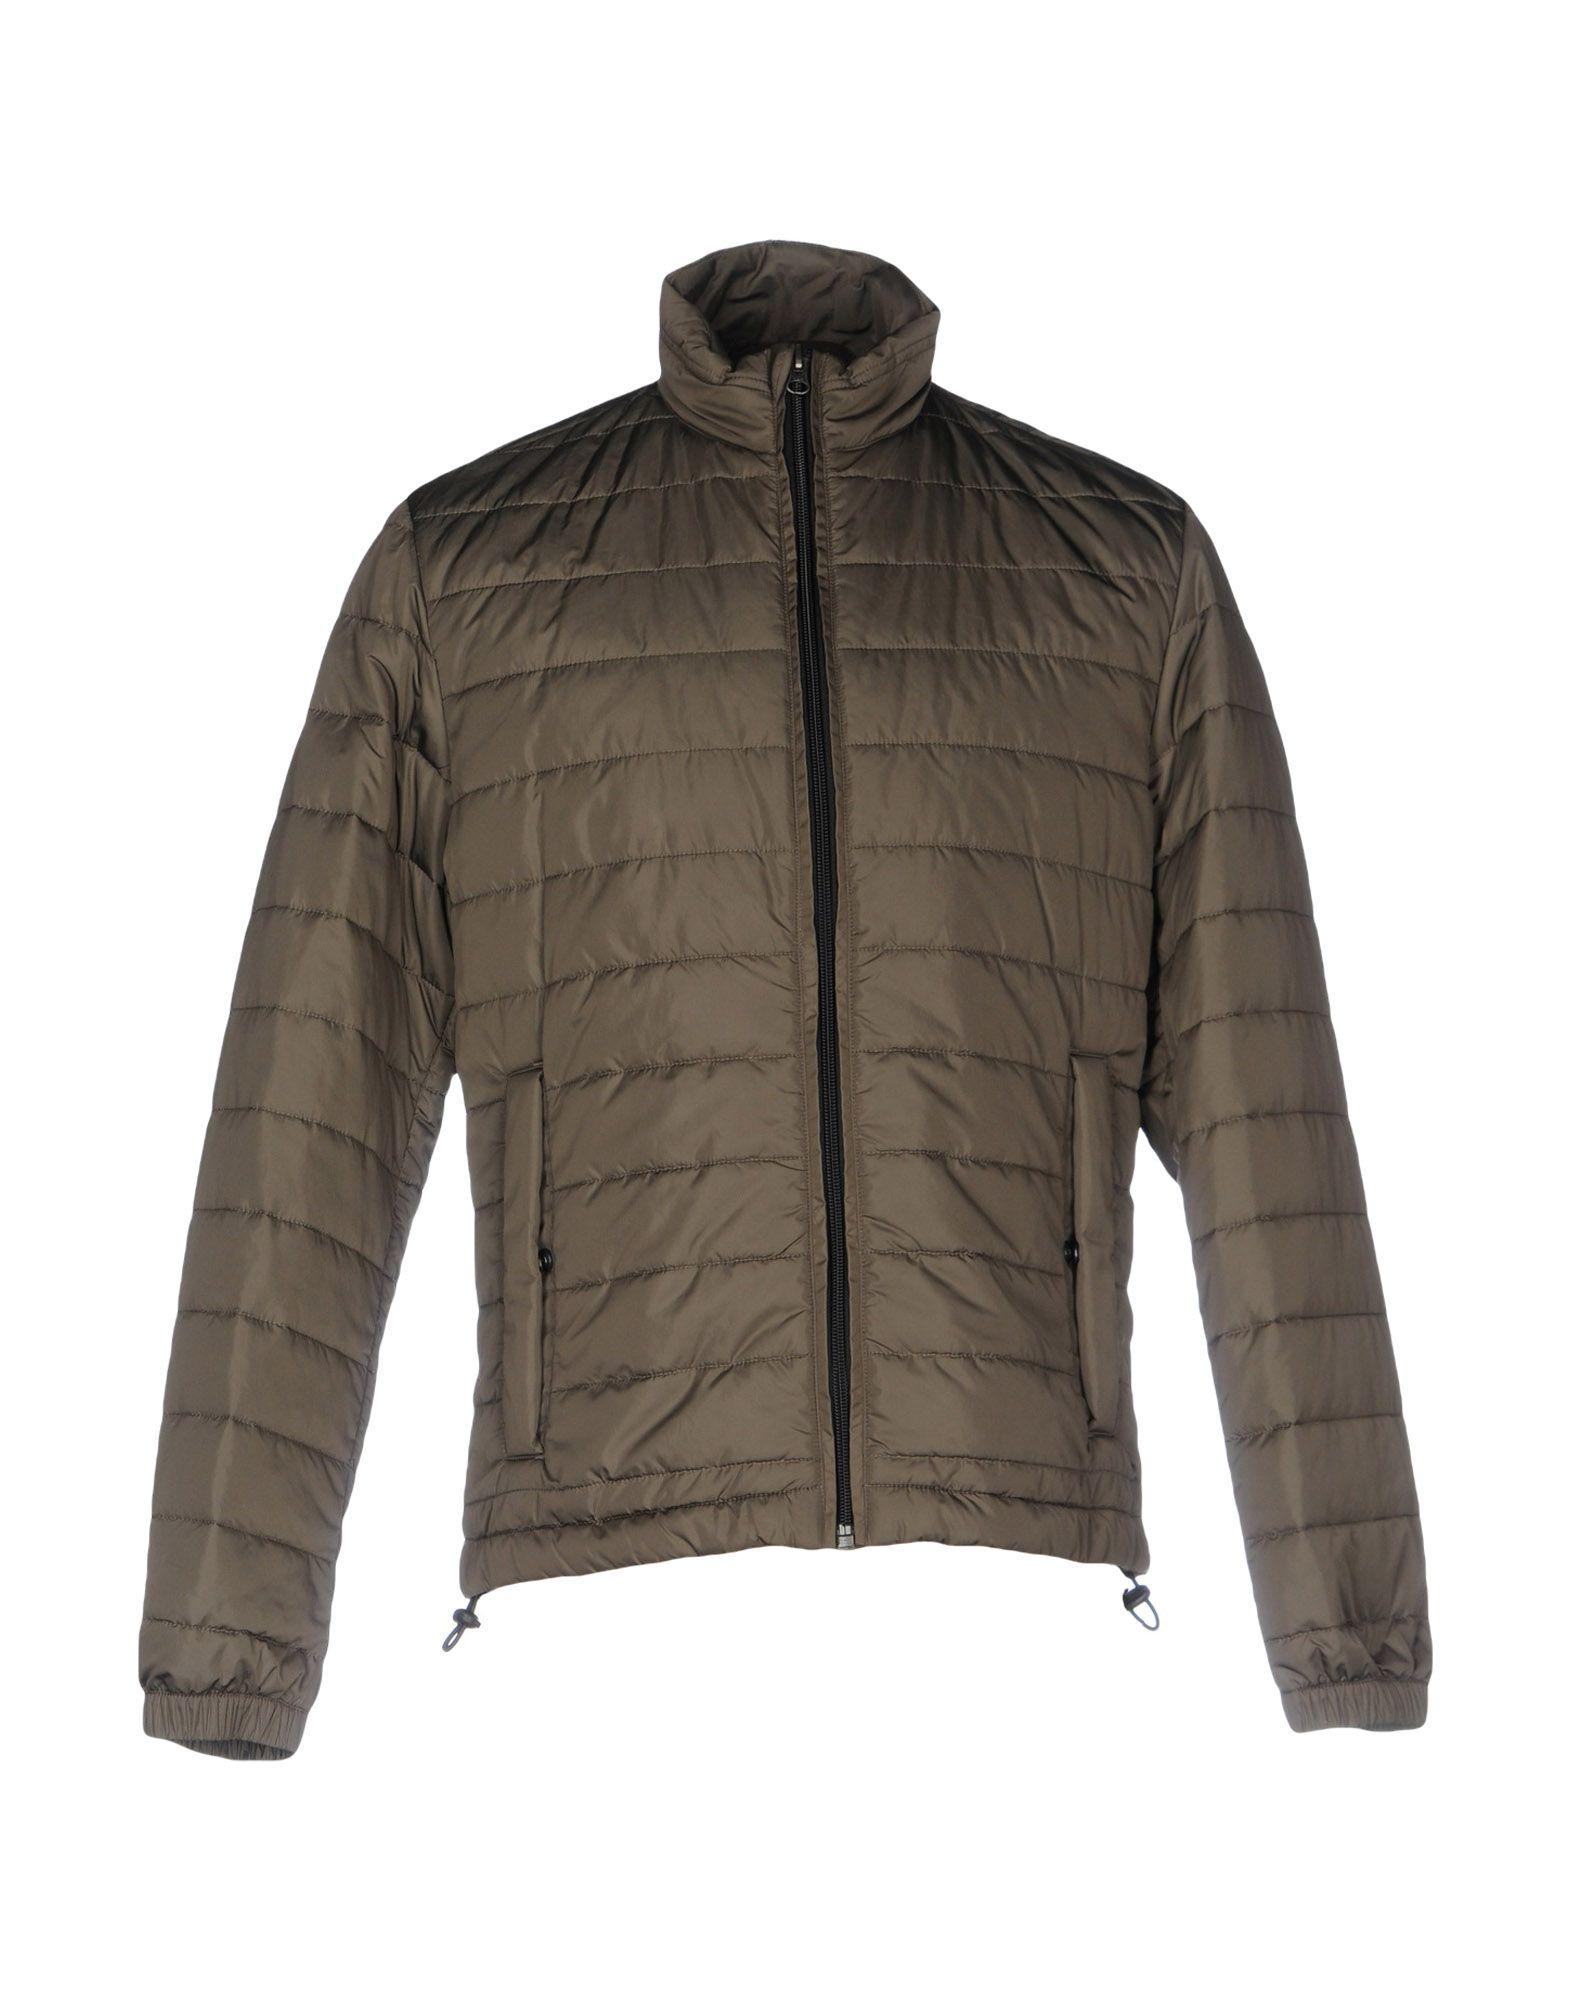 OSCAR JACOBSON Jacket in Grey